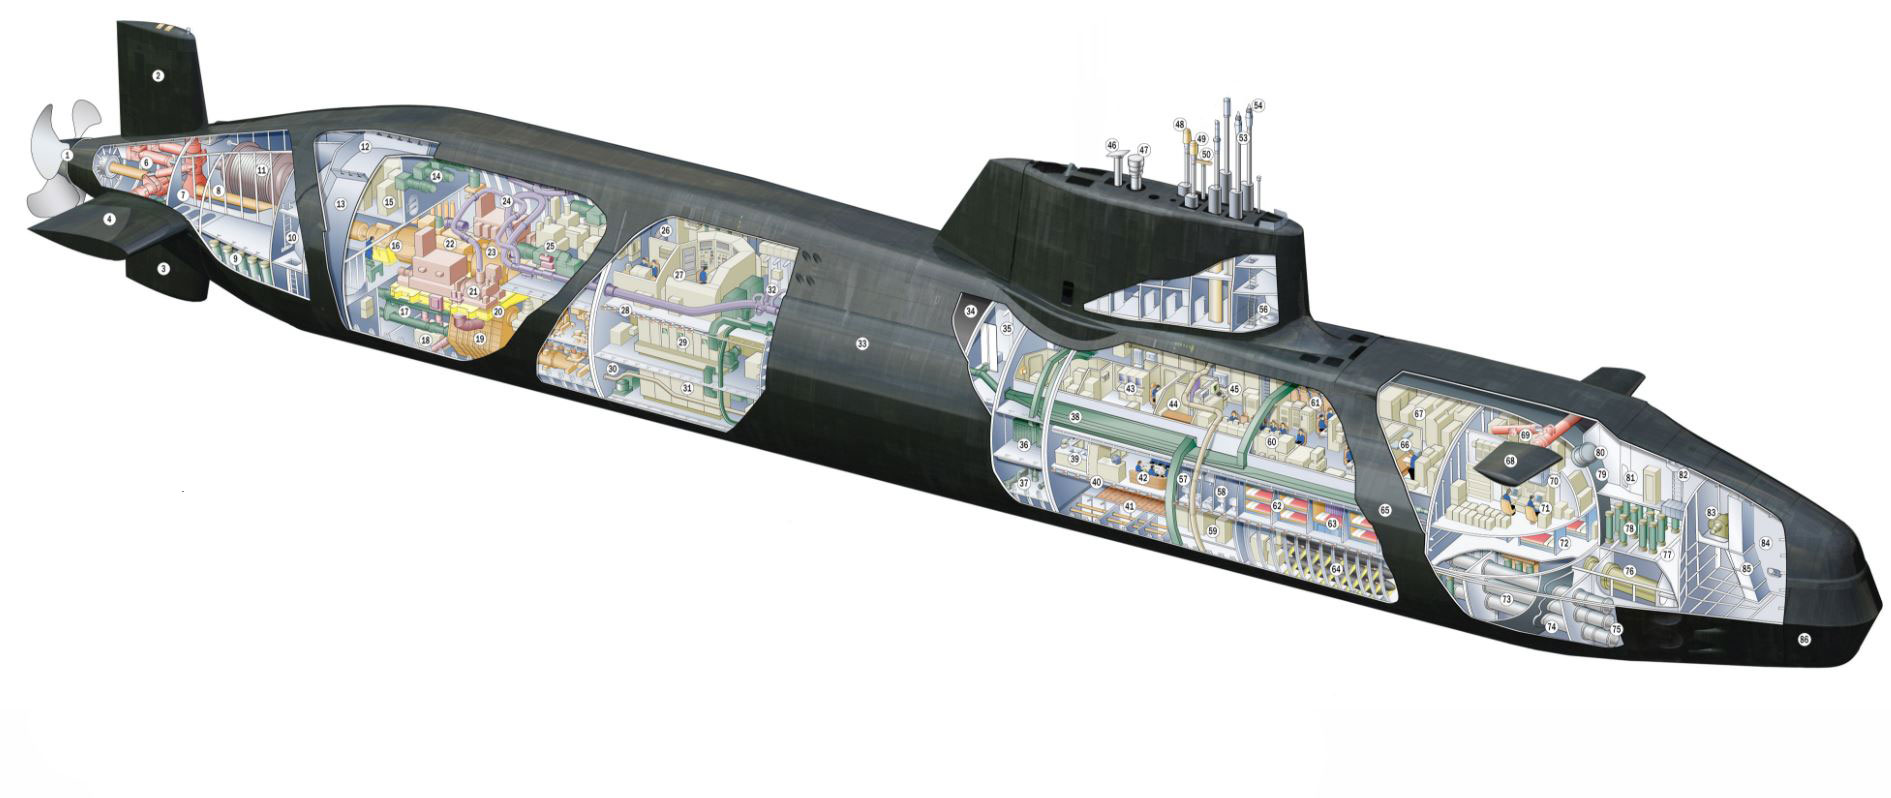 Astute-class submarine cutaway